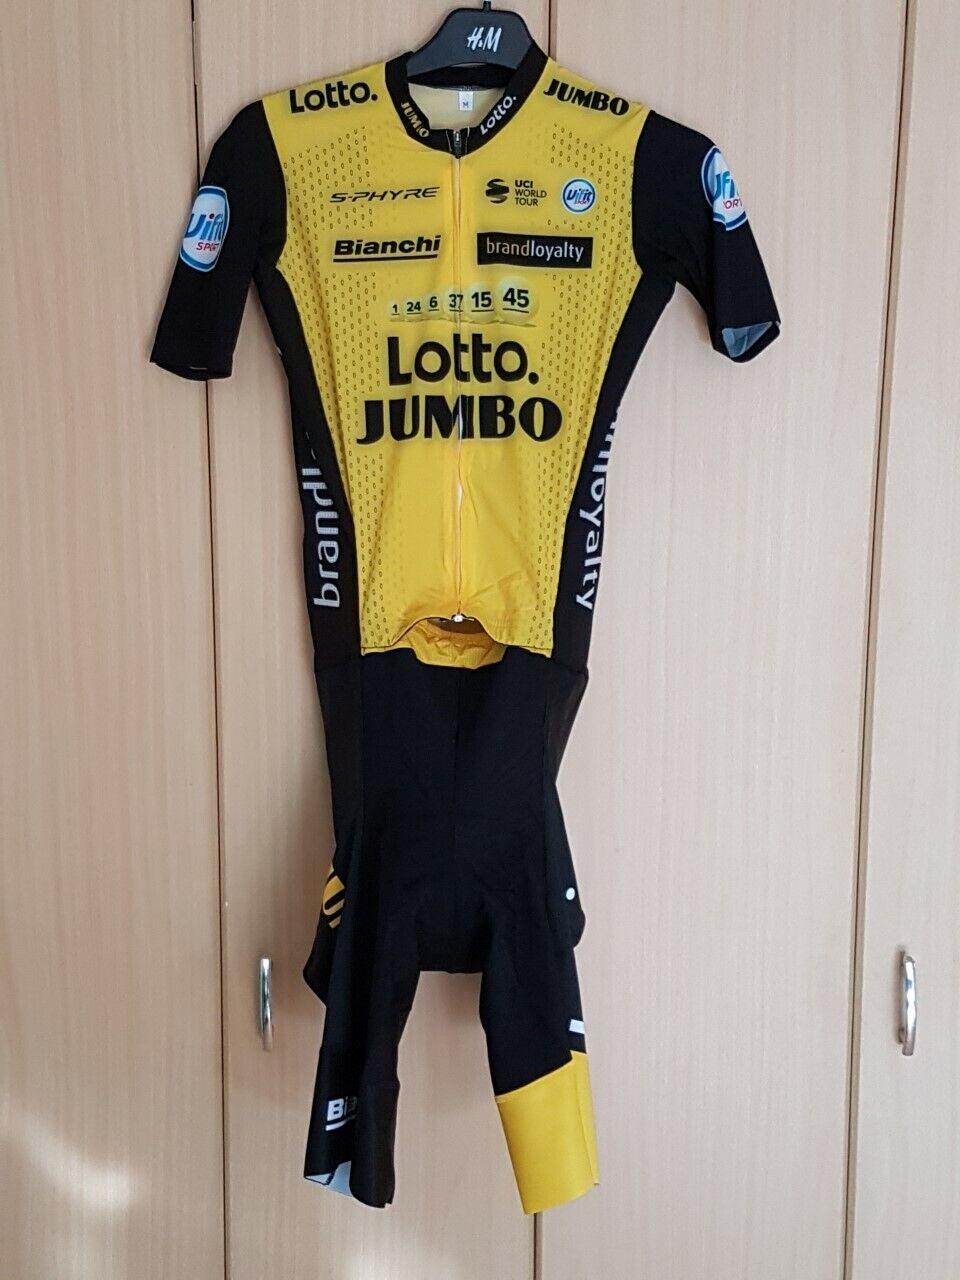 Original Shimano Lotto Jumbo 2018 Sprint Suit (XS)